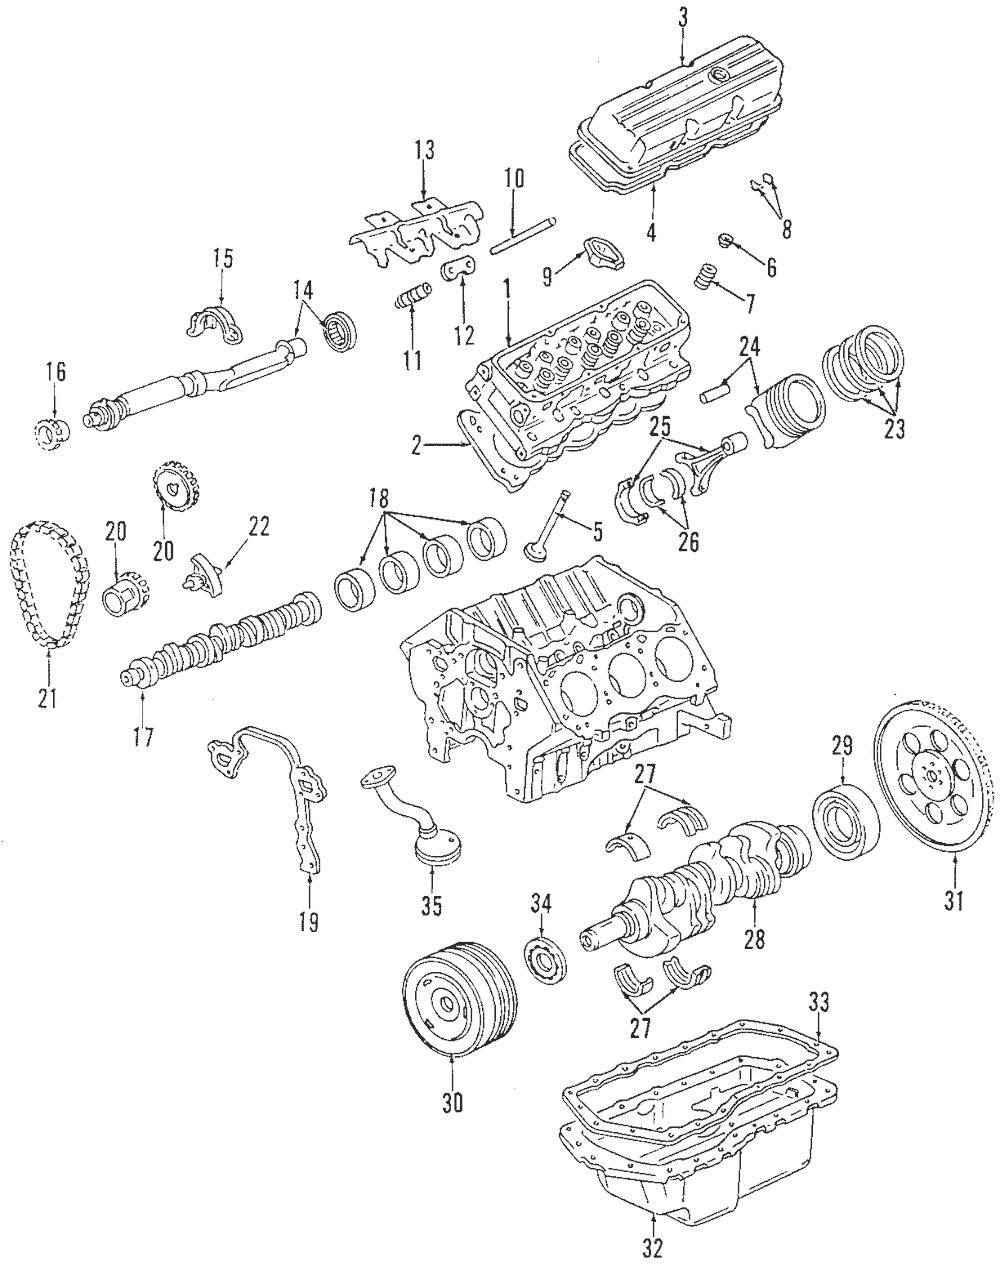 OEM NEW 1995-2005 GM Buick Chevrolet Oldsmobile Engine